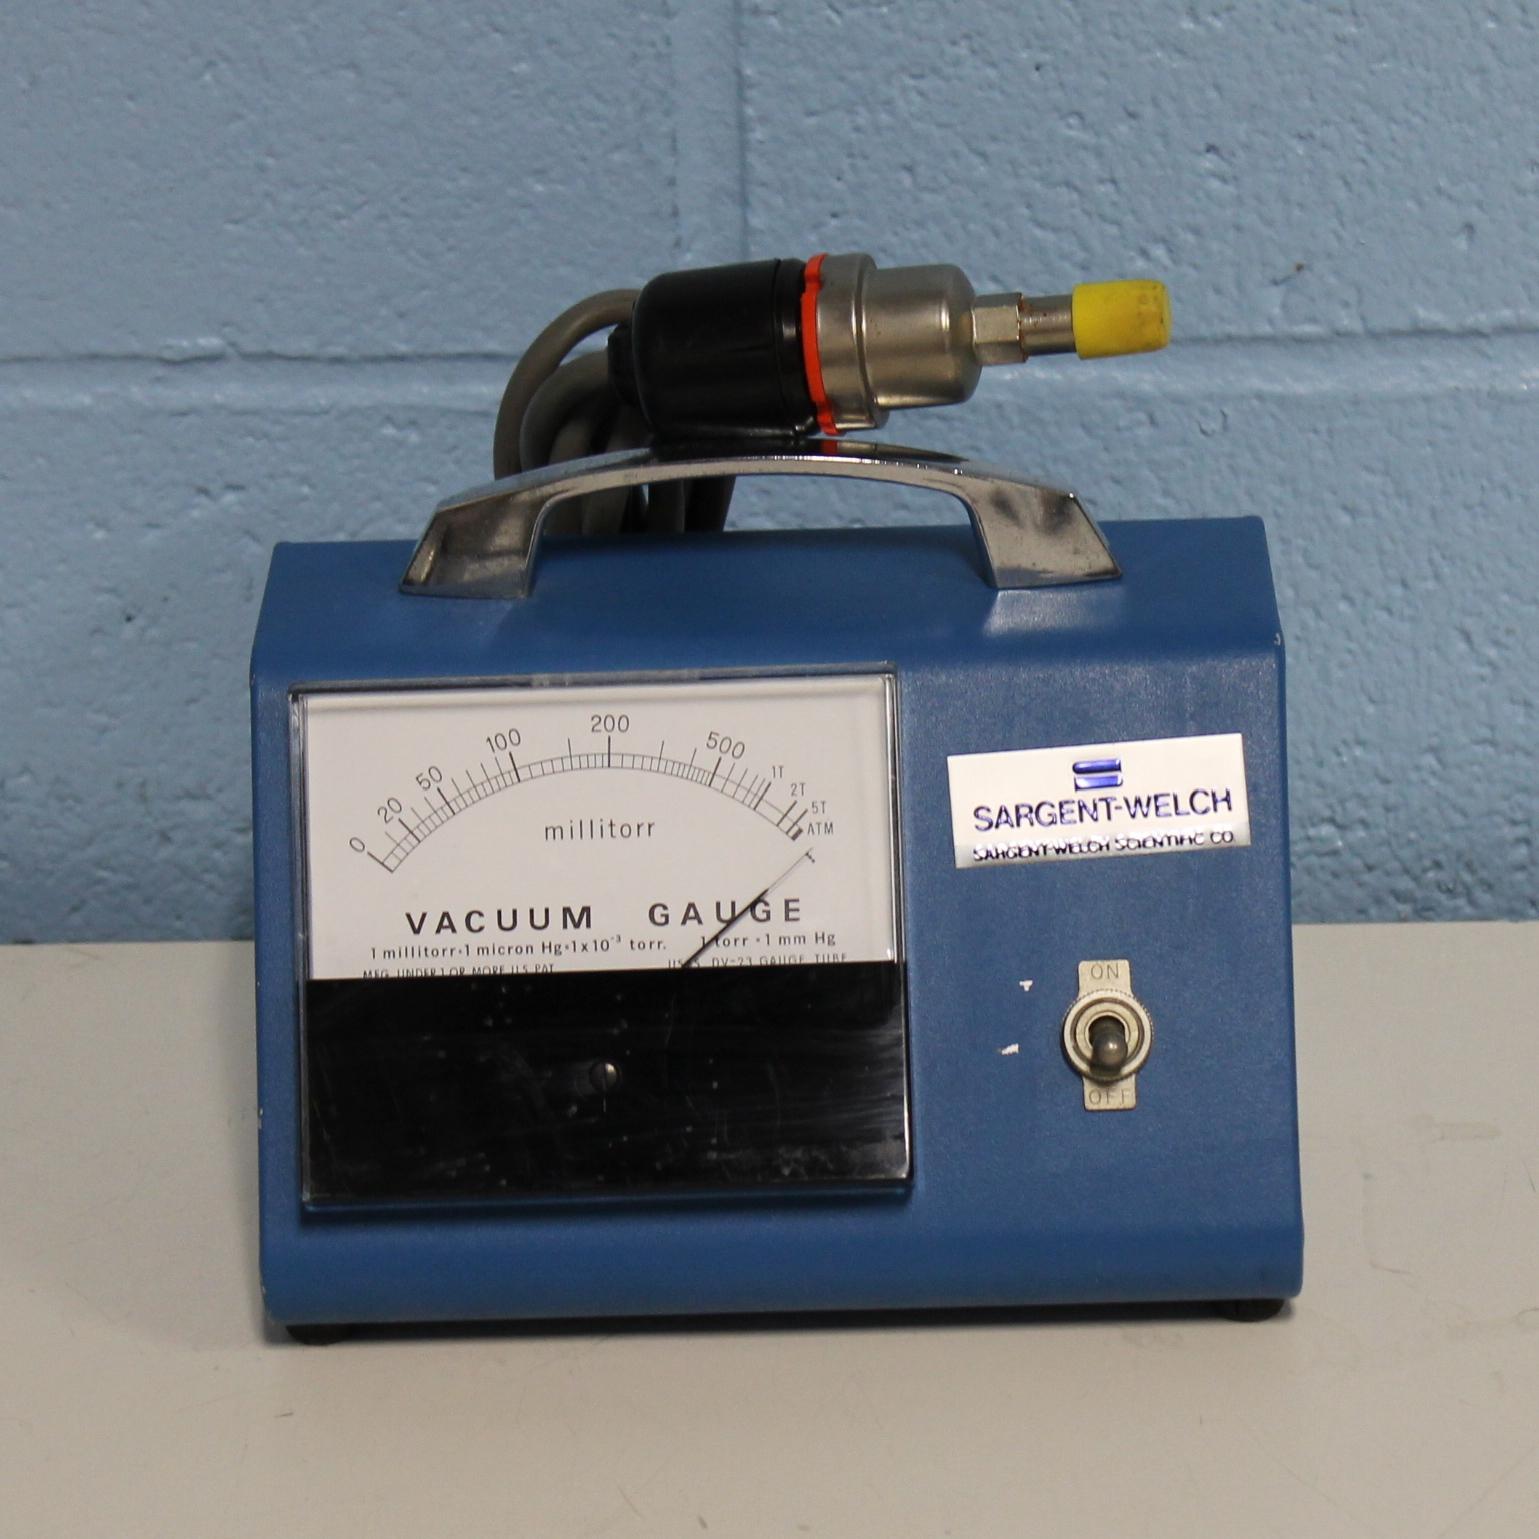 Sargent-Welch 1515 Vacuum Gauge Image